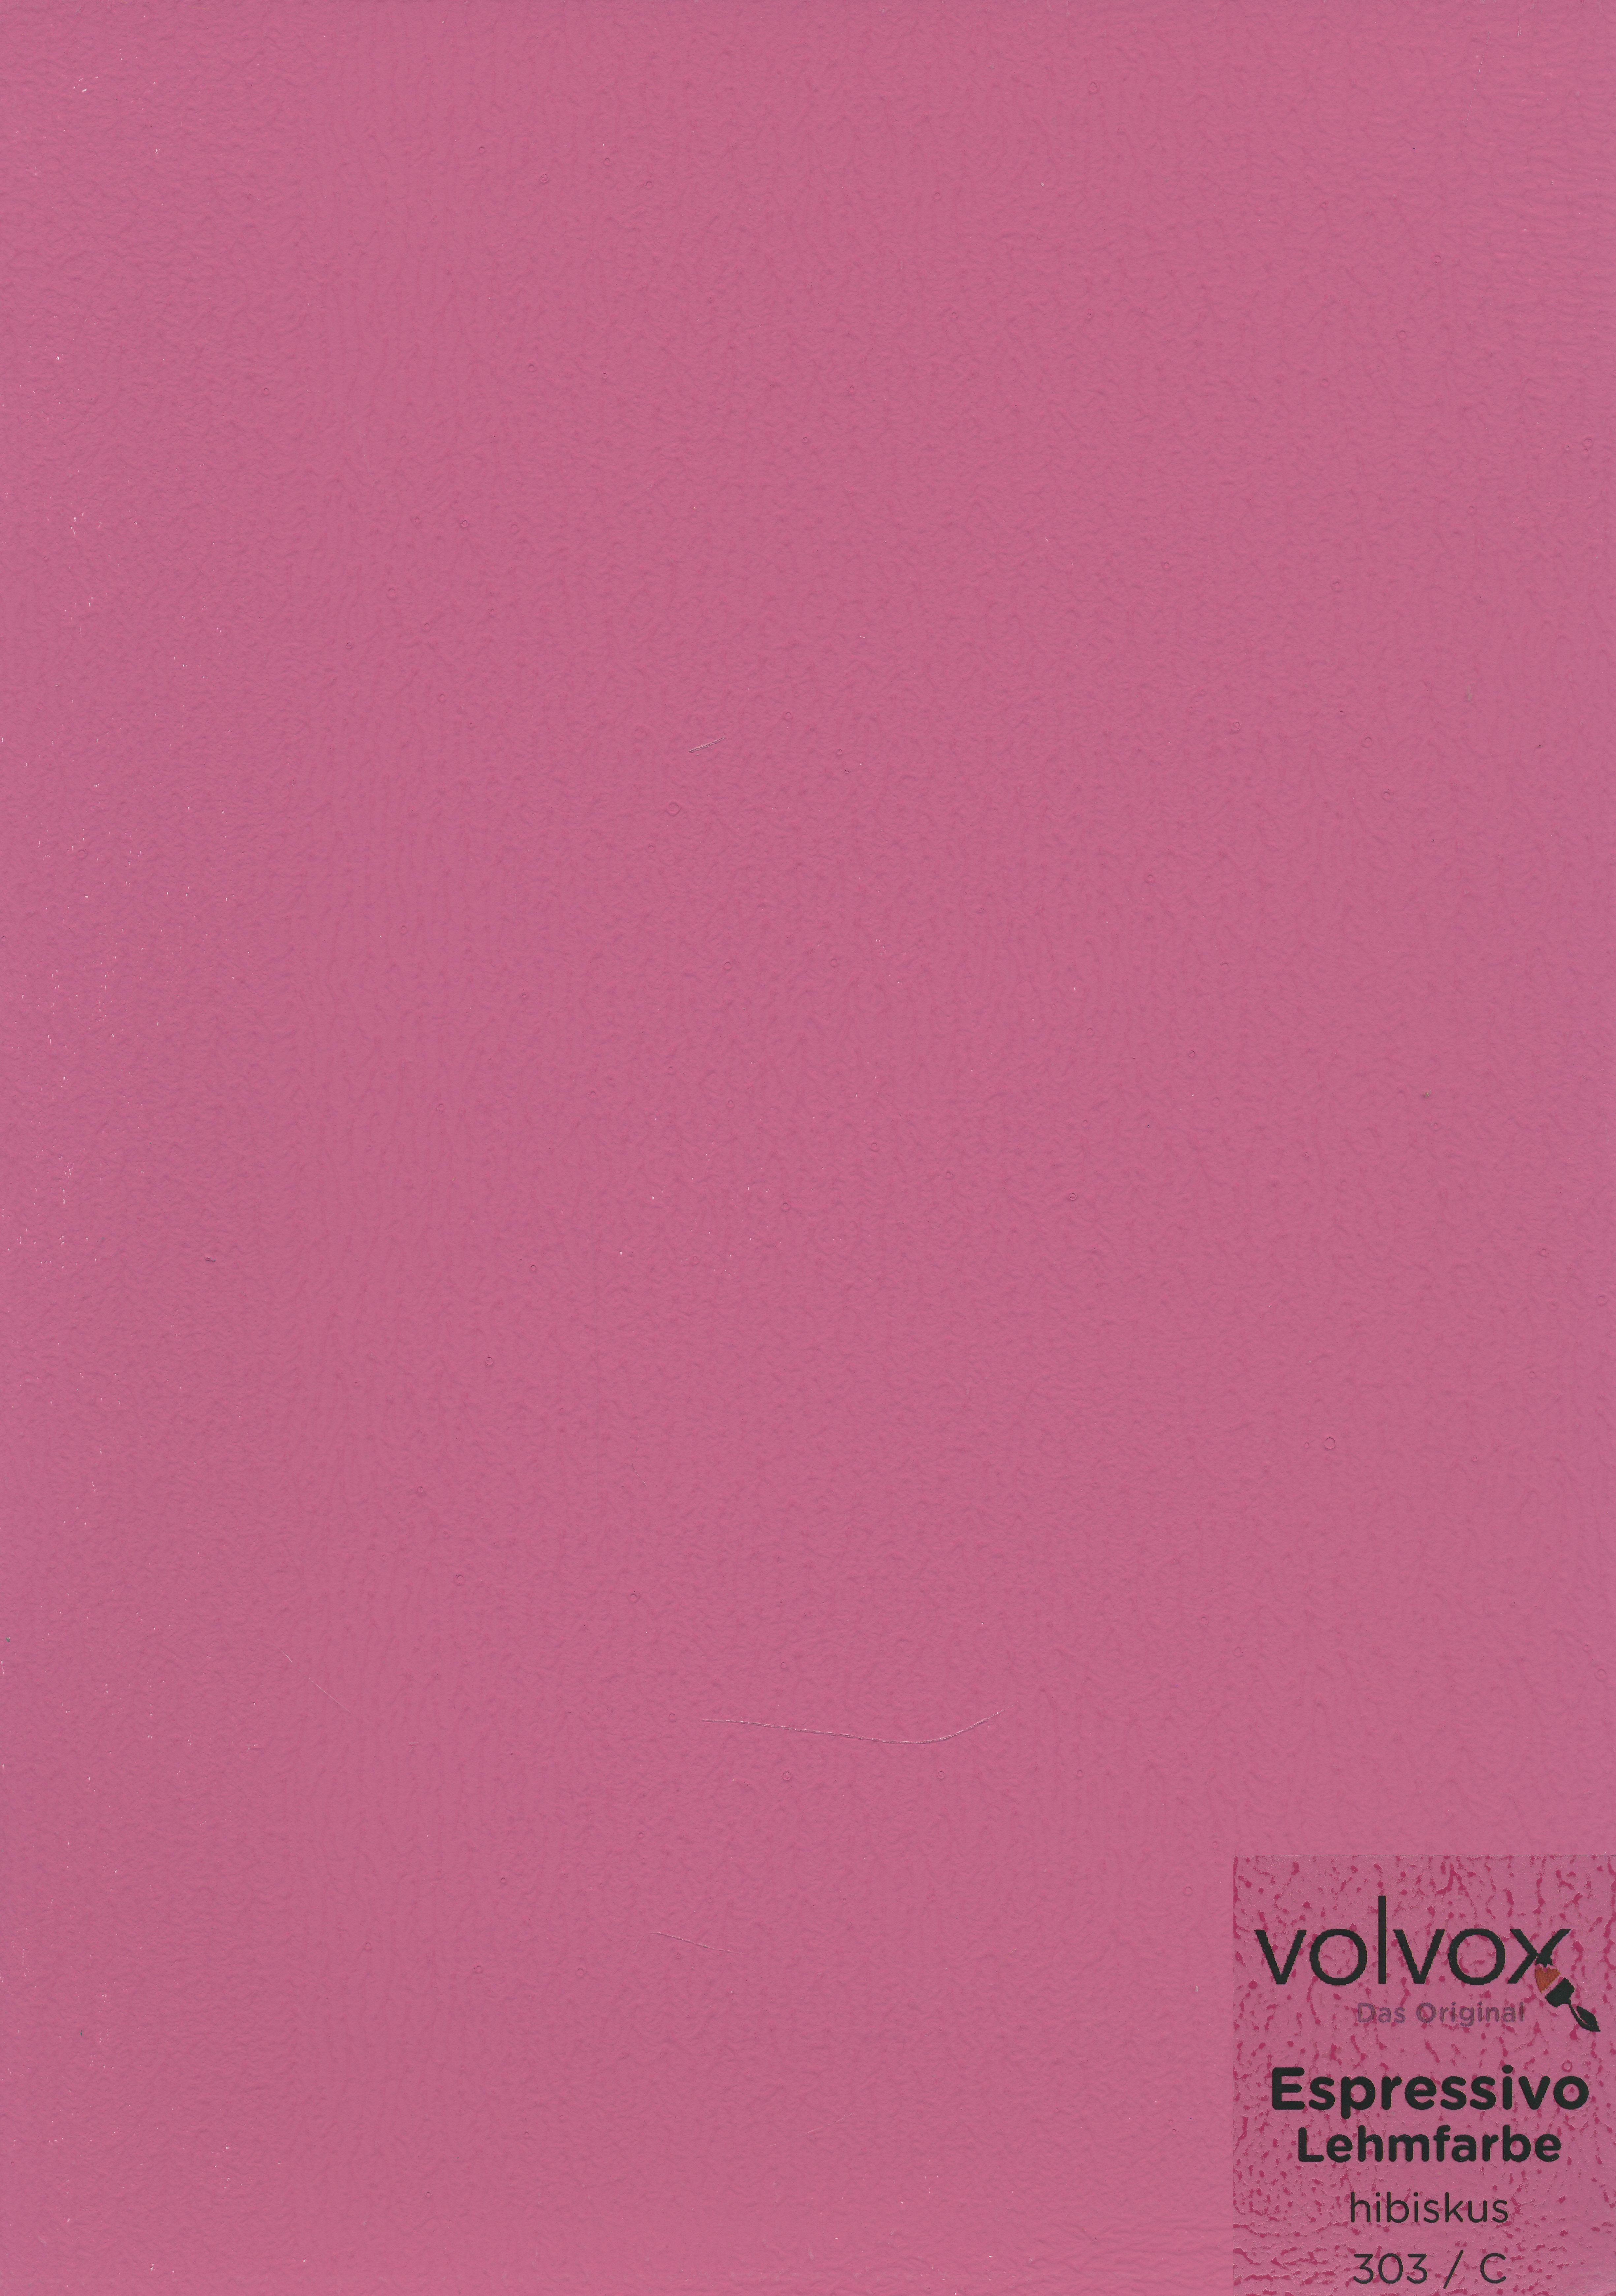 Volvox Espressivo Lehmfarbe 303 hibiskus